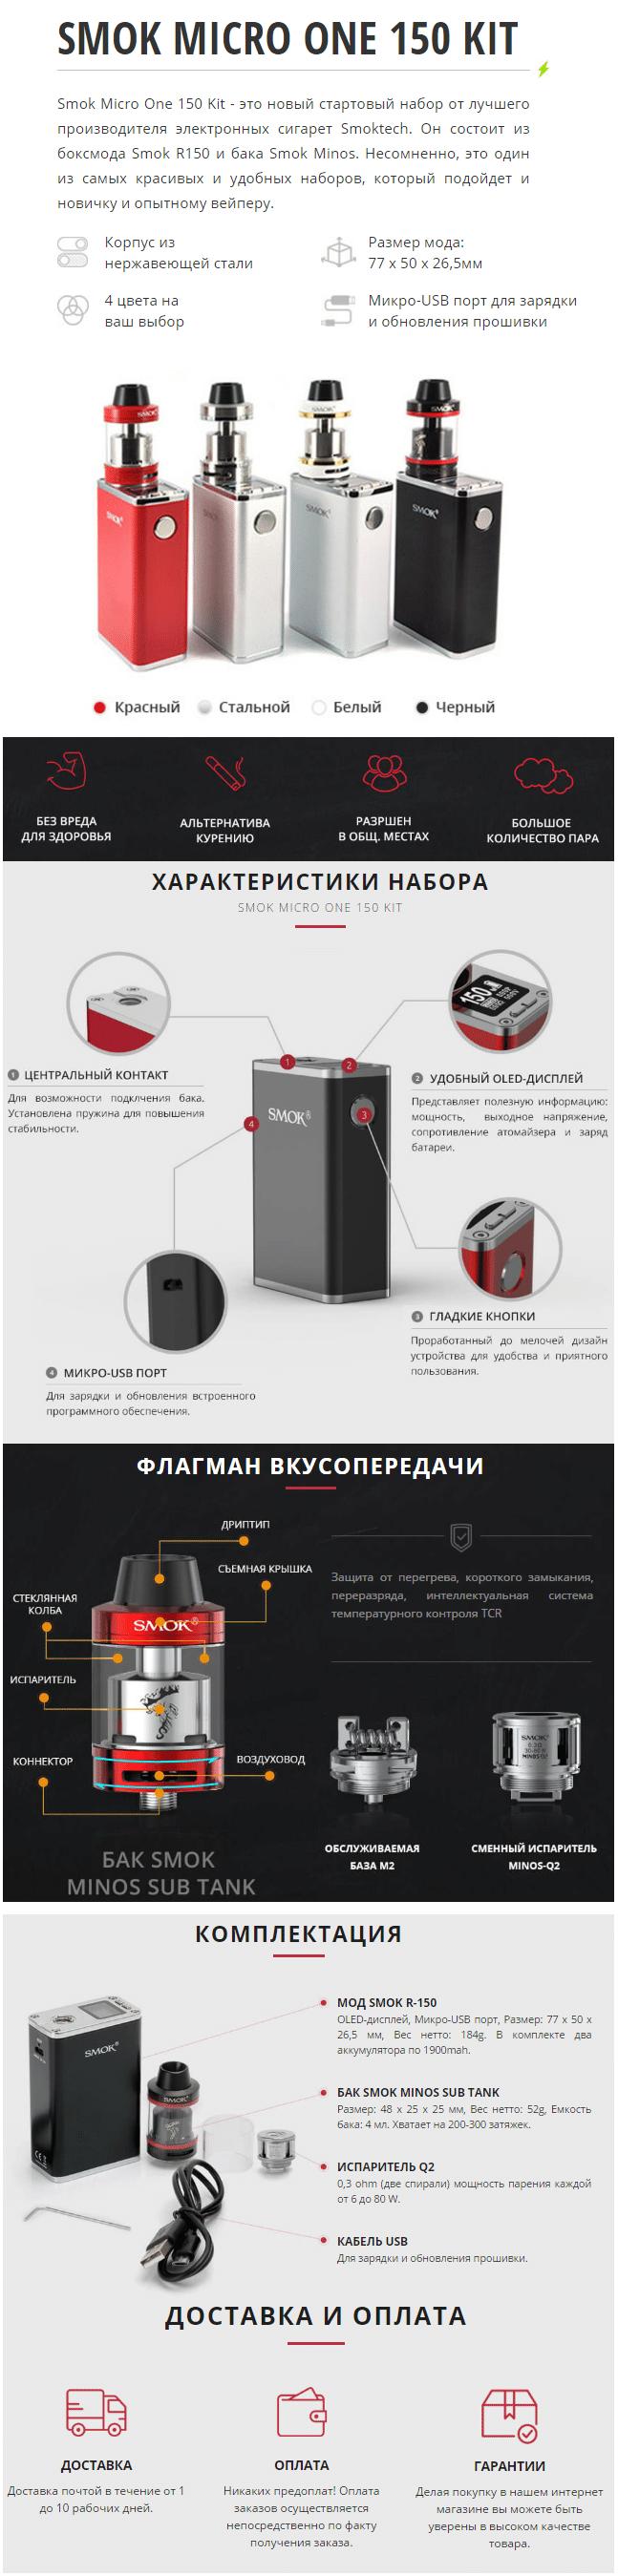 набор электронных сигарет Vape Smok Micro One 150 Kit купить